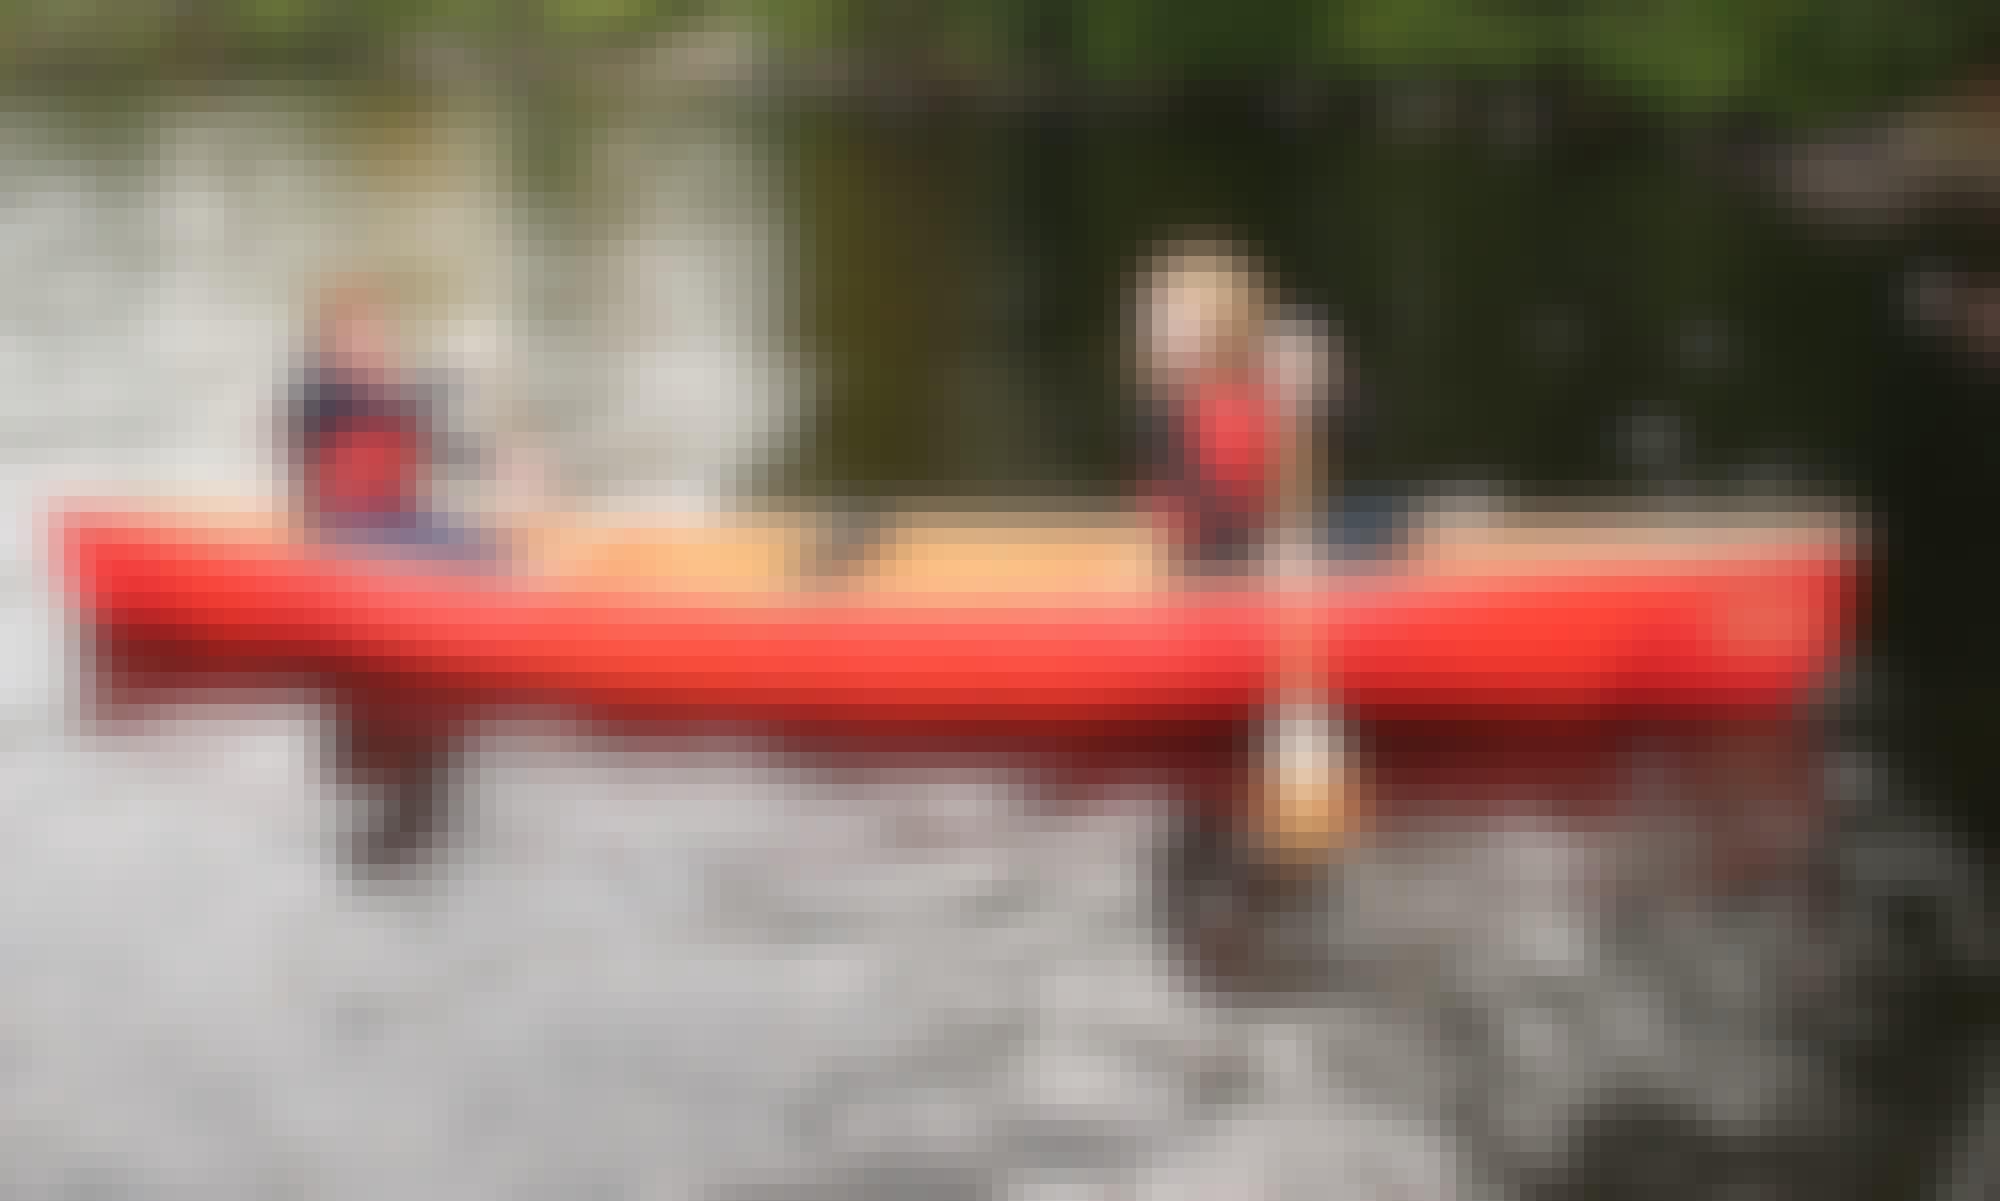 2 seater Kevlar Canoes Rental in Brule River, Wisconsin